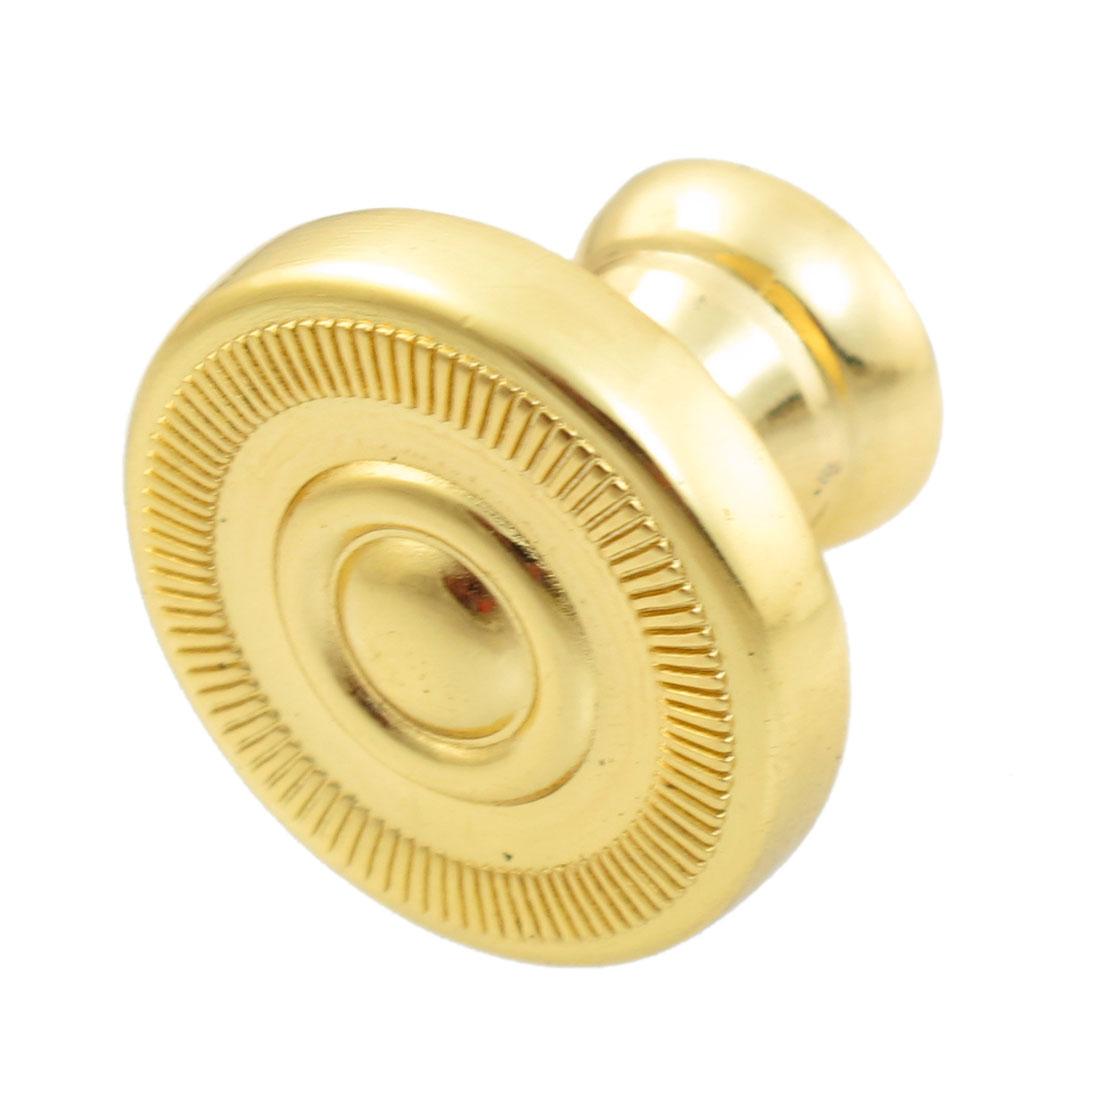 Vintage Gold Tone Drawer Dresser Cabinet Round Knob Pull Handle 2.5cm